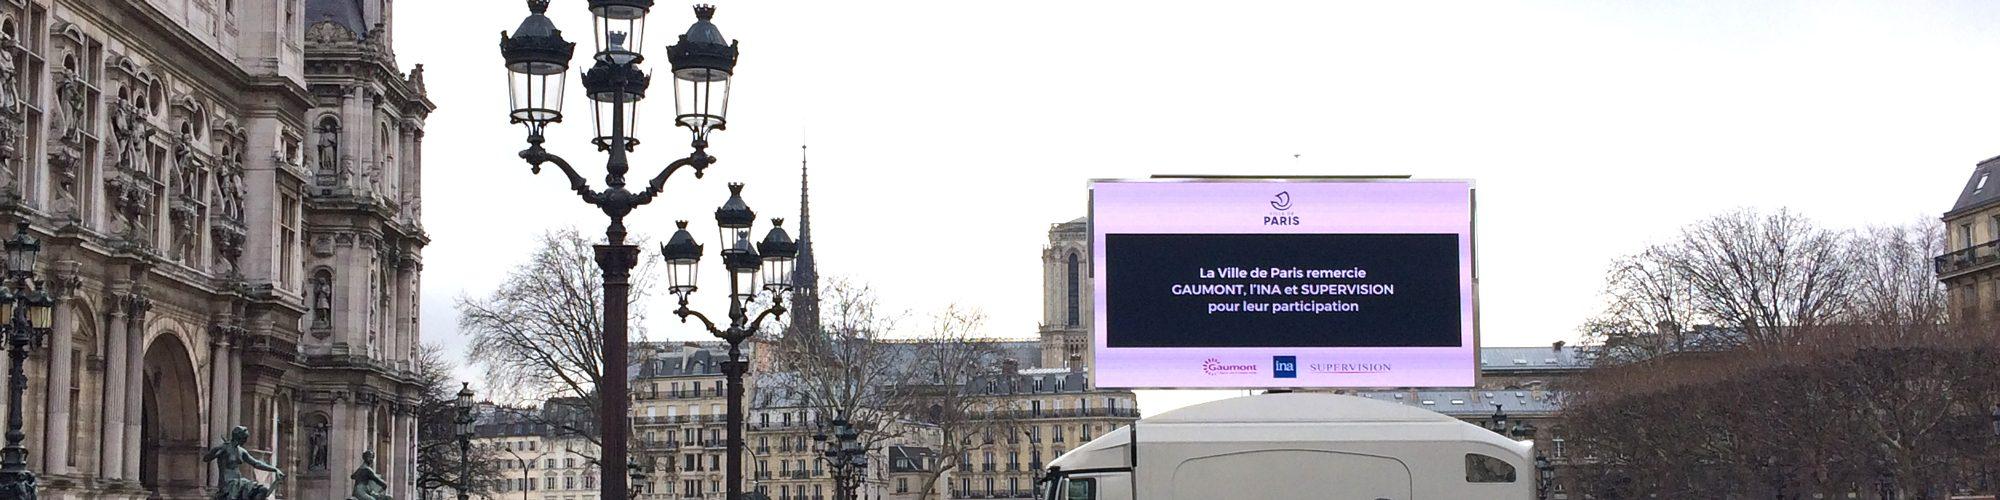 pantalla-gigante-led-supervision-michel-legrand